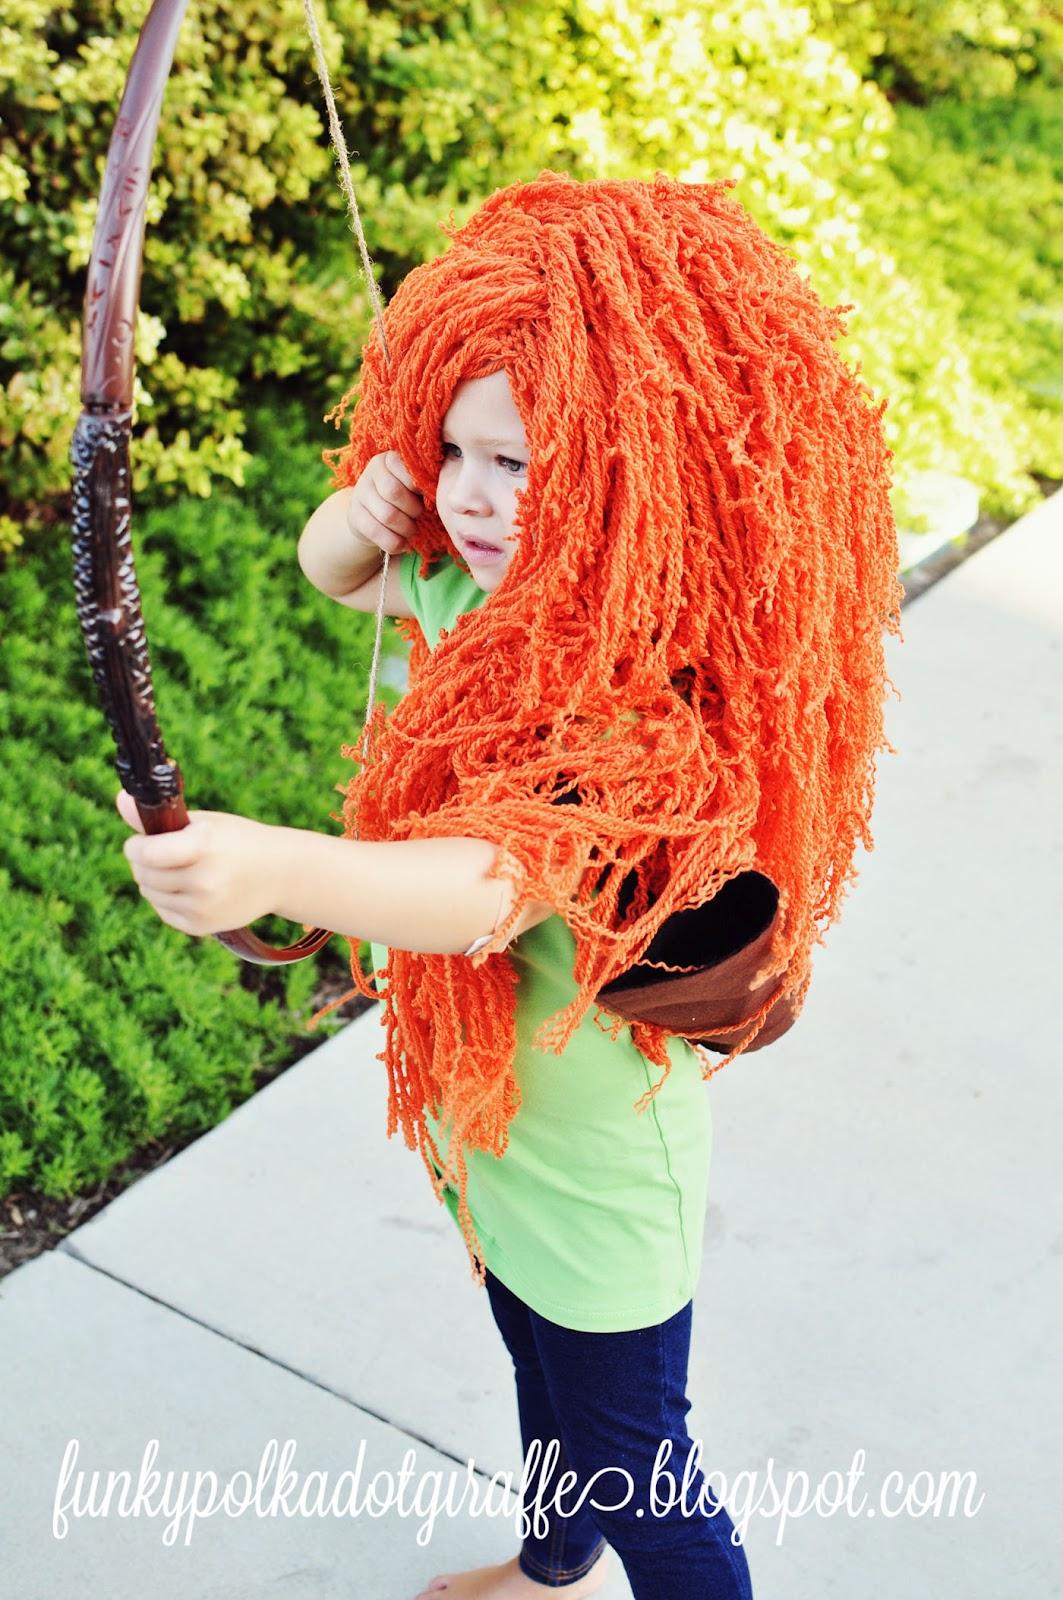 Funky Polkadot Giraffe Wiggin Out Princess Costume Wig